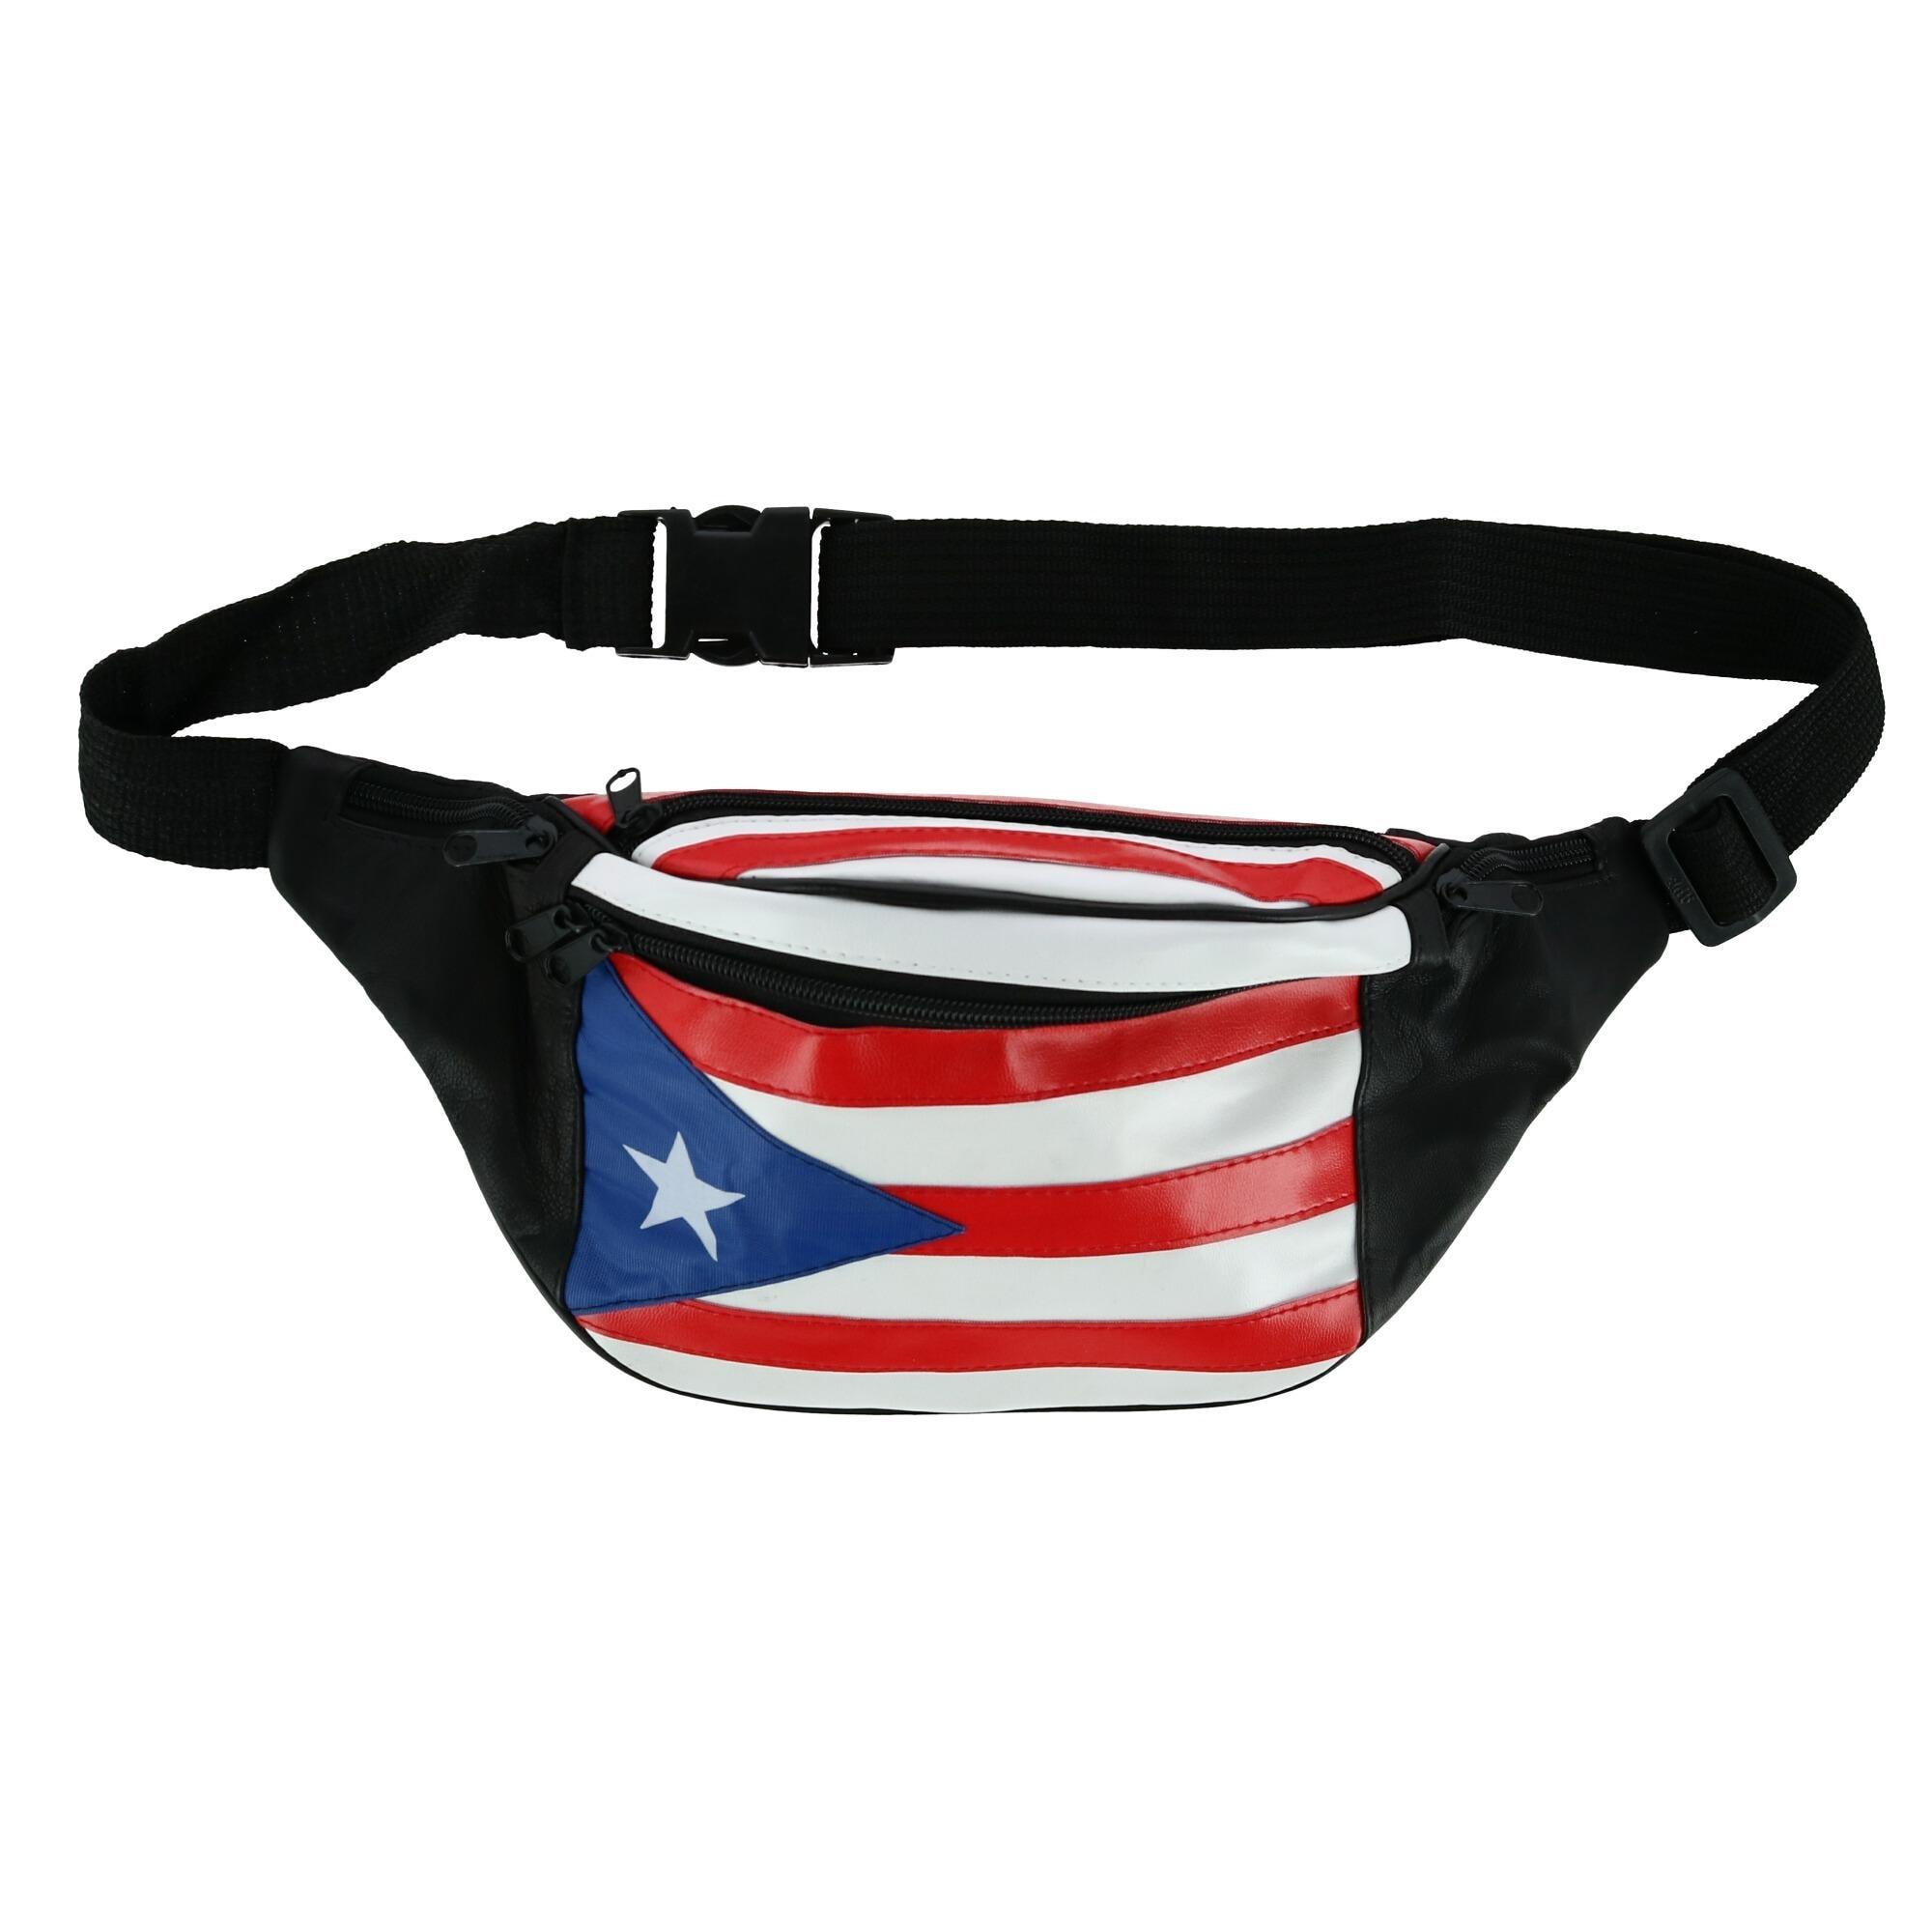 Puerto Rico Flag Sport Waist Bag Fanny Pack Adjustable For Run